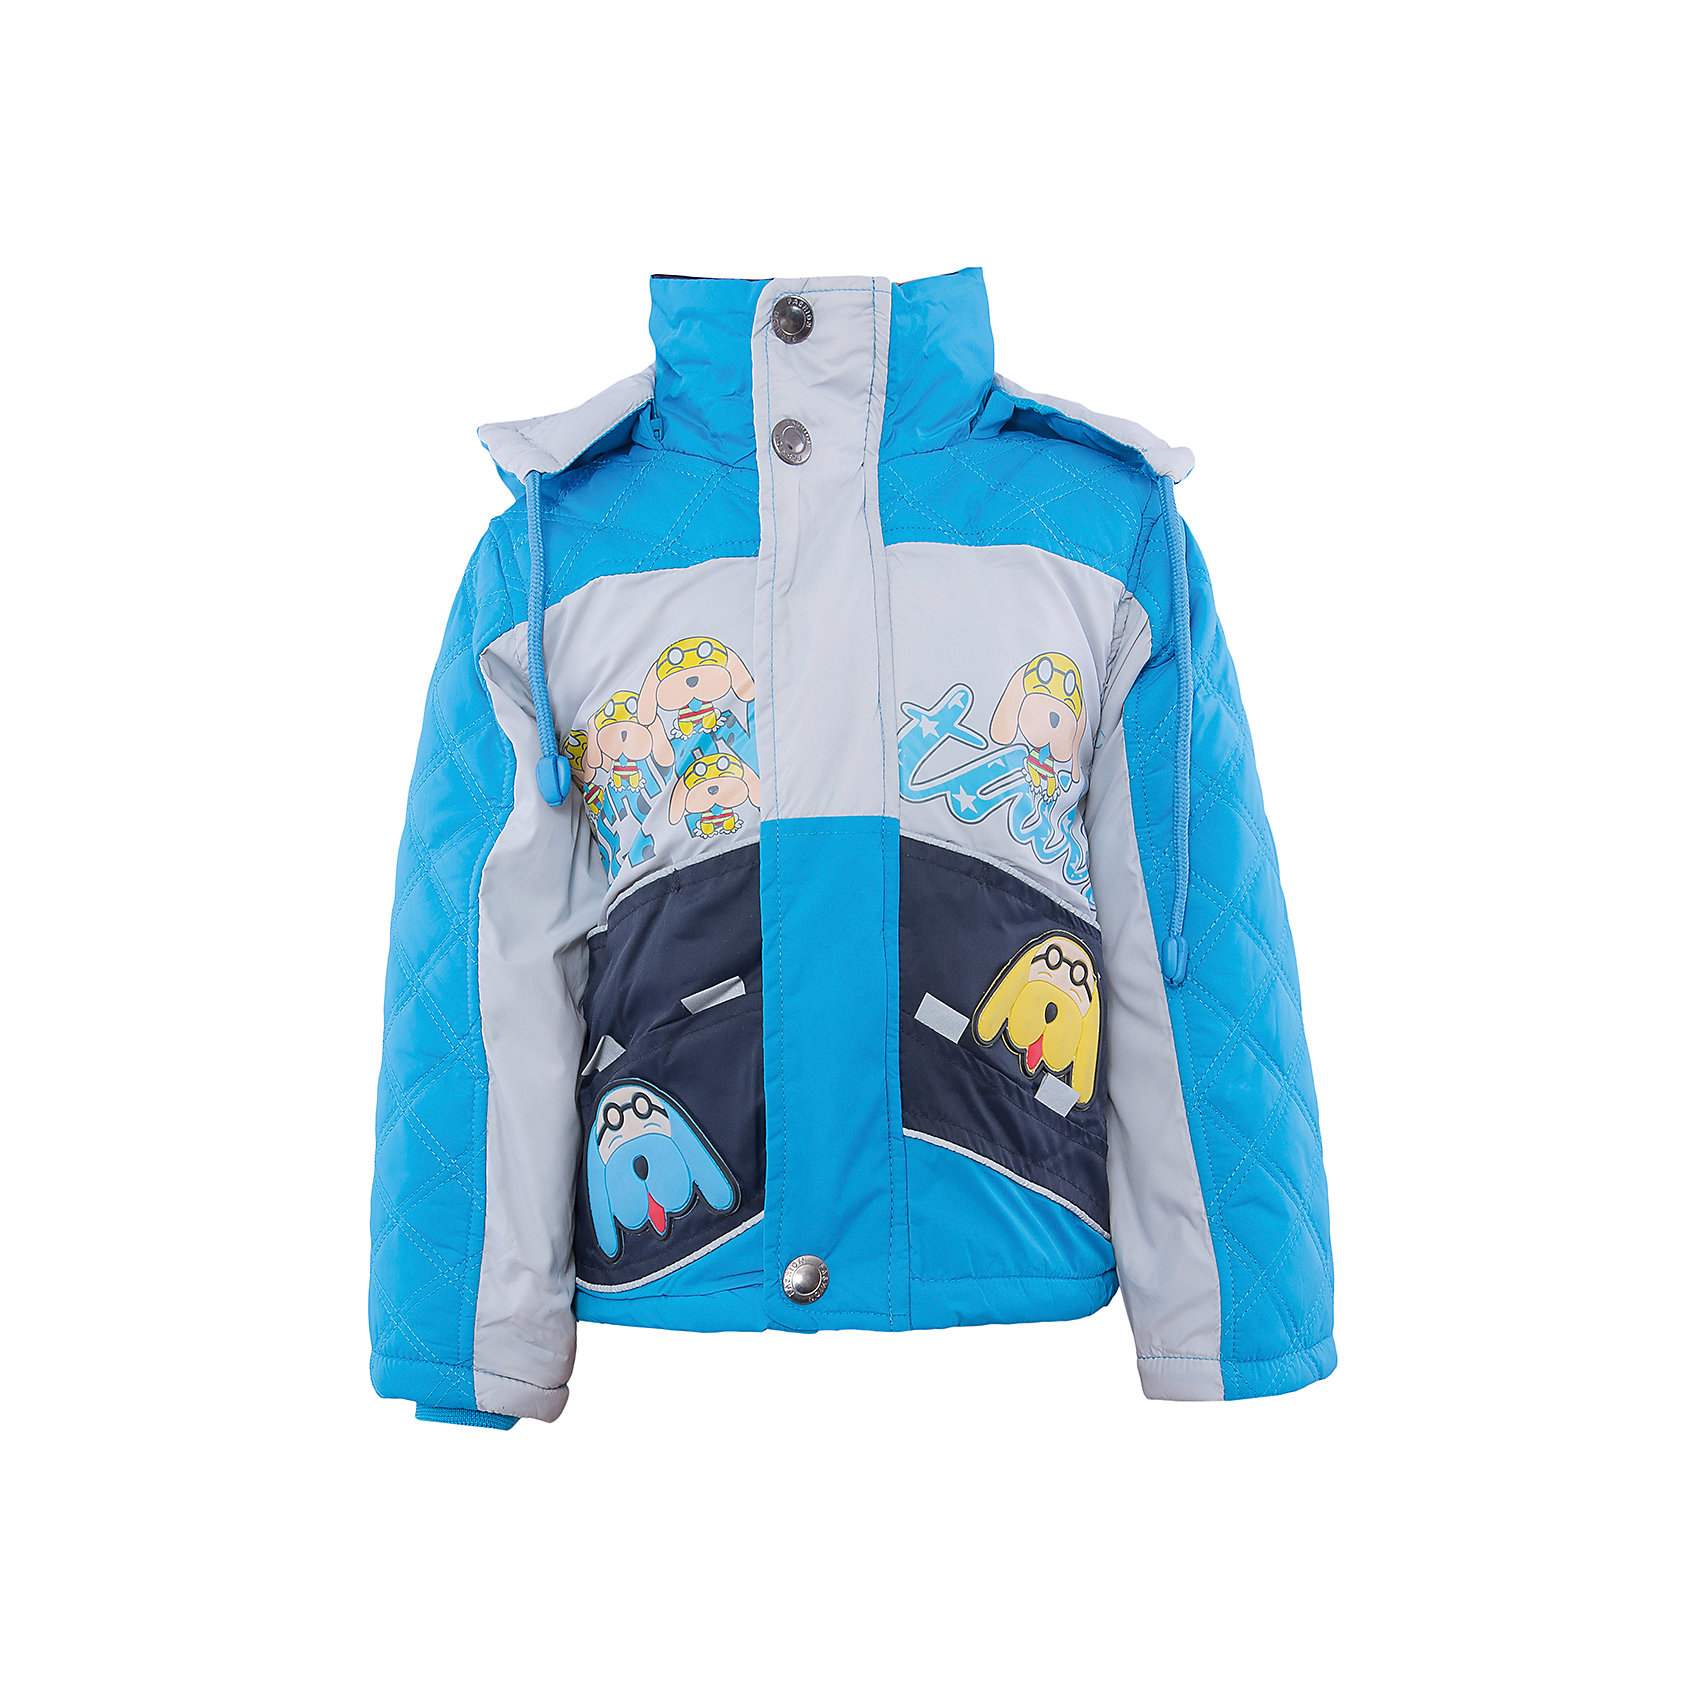 DAUBER Куртка для мальчика DAUBER куртка для мальчика byb1034 синий y clu